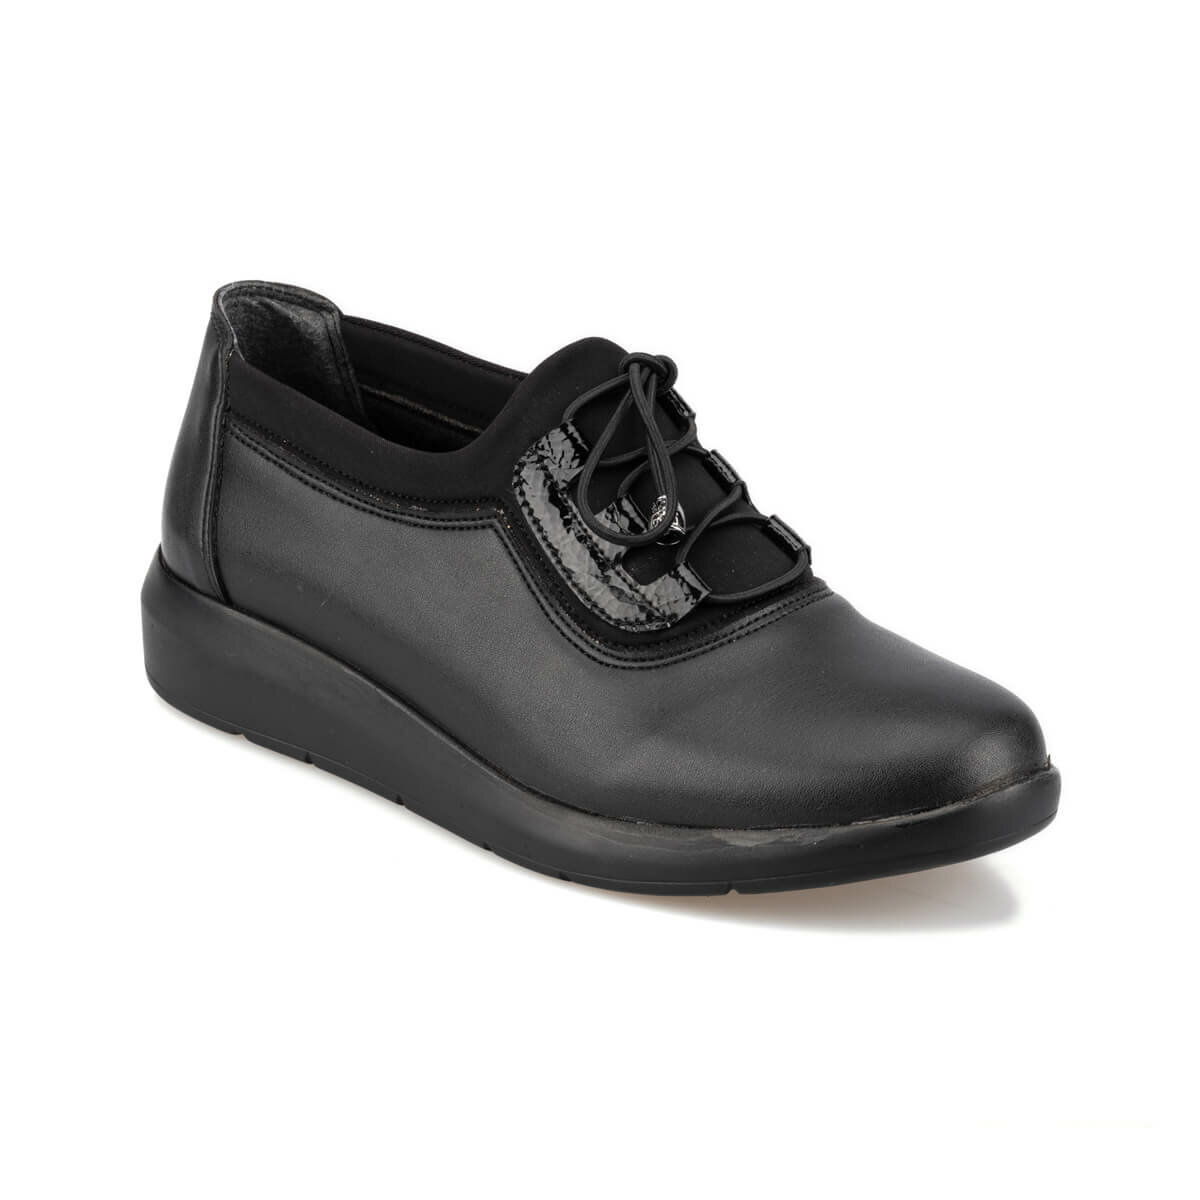 FLO 92.151054CZ Black Women 'S Sneaker Shoes Polaris